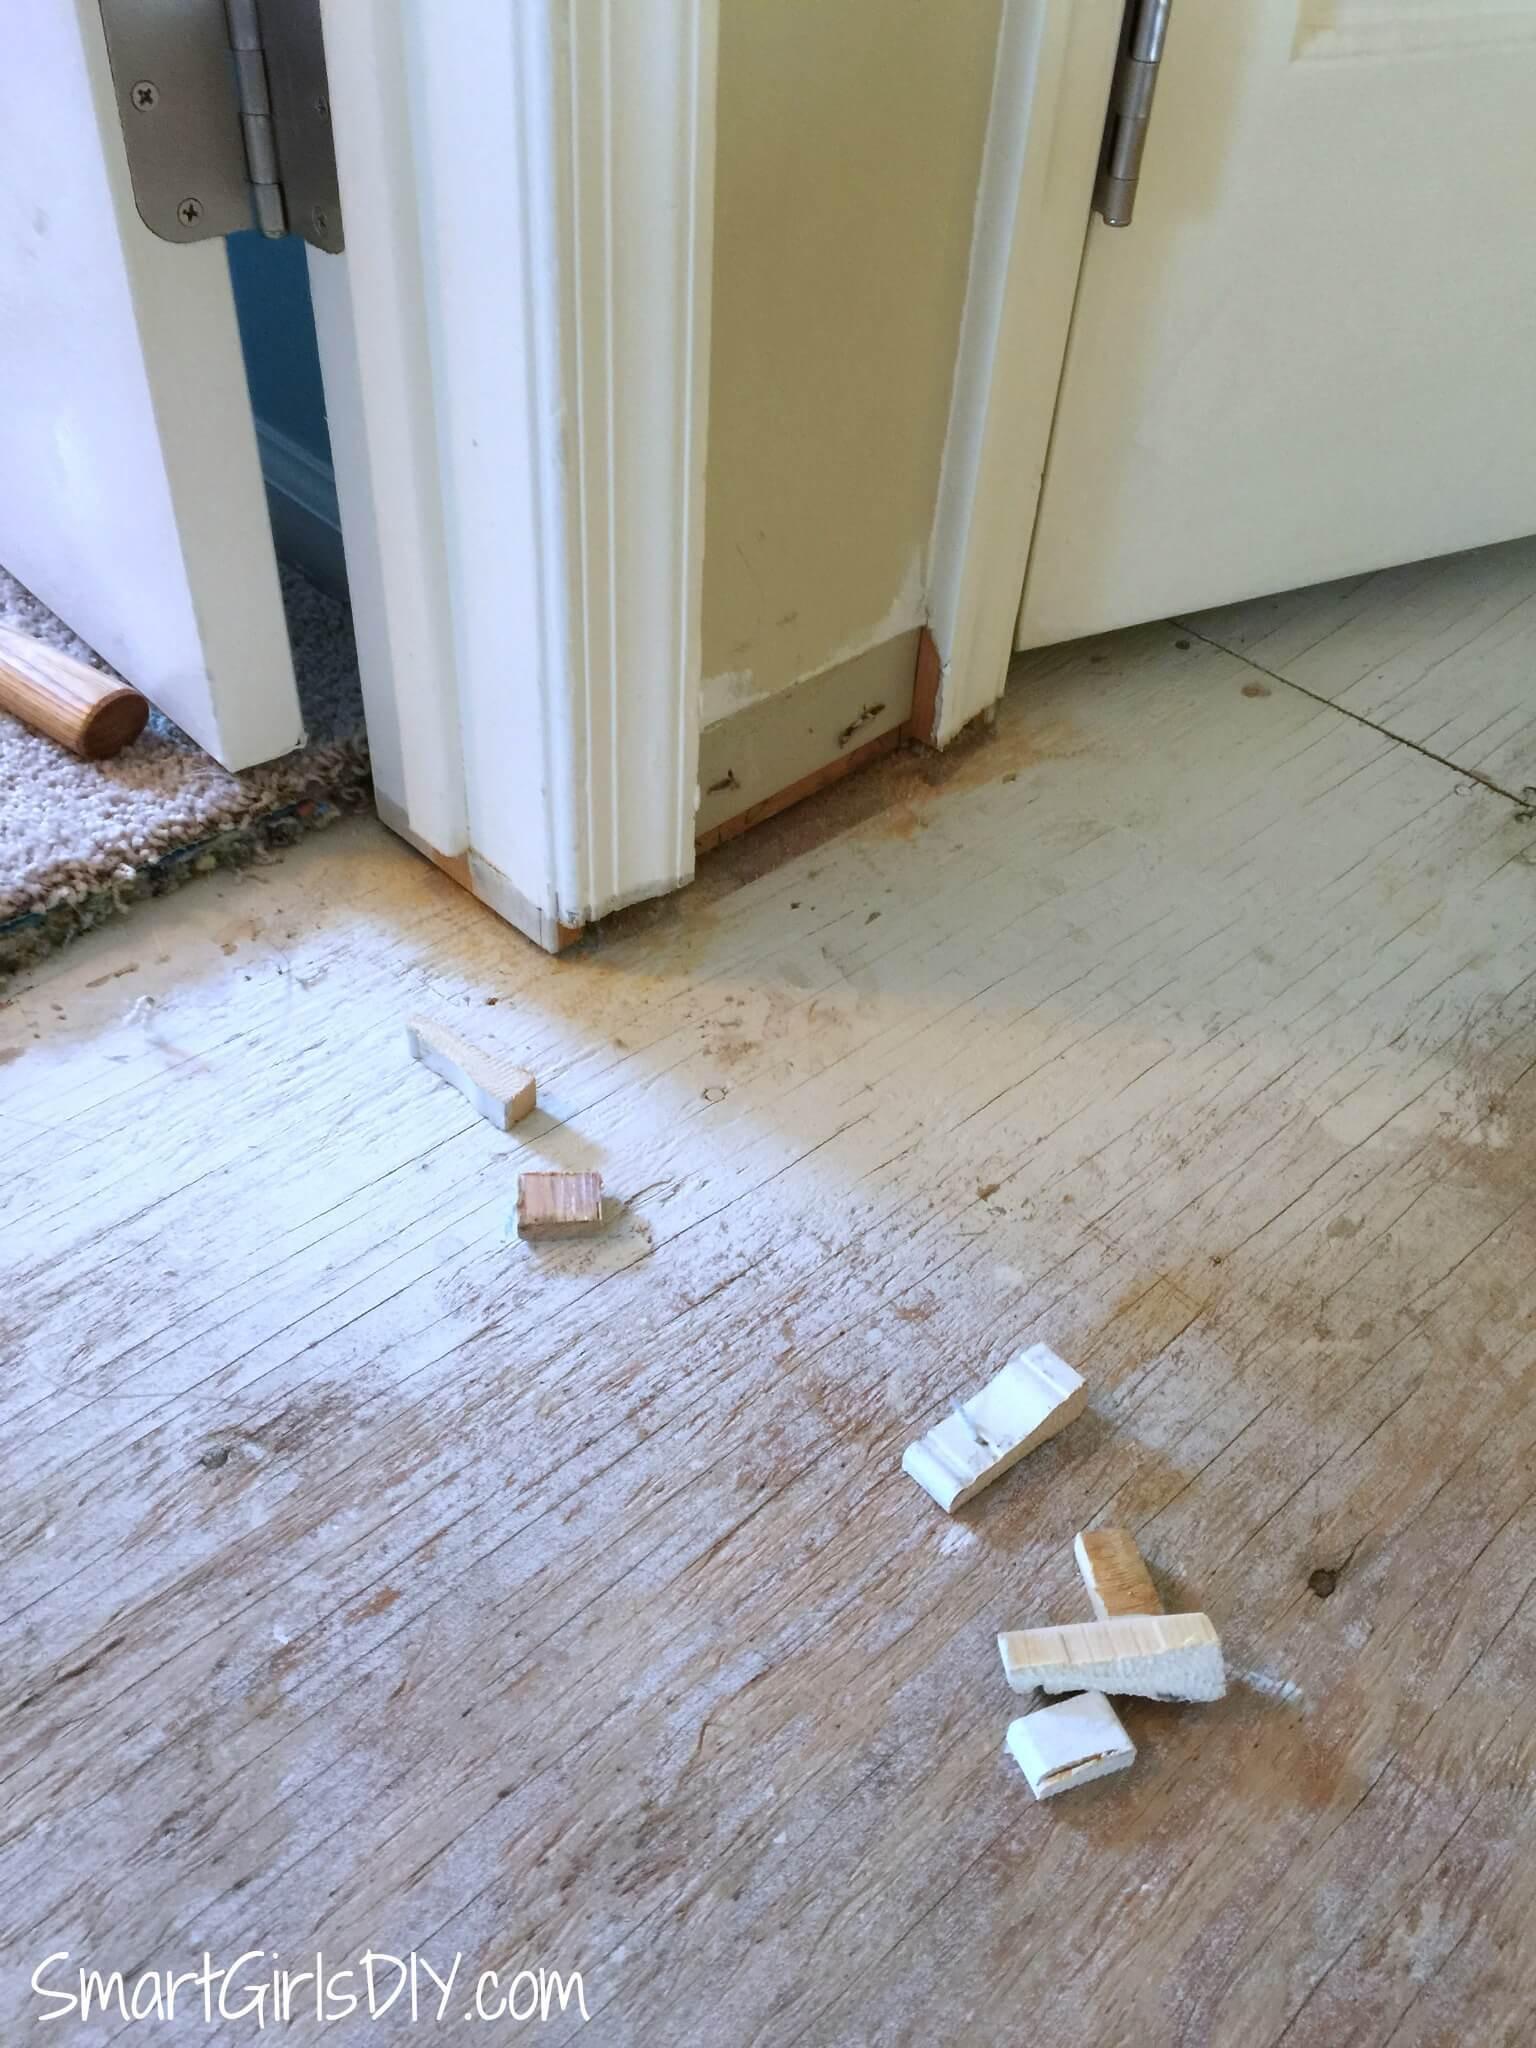 21 Amazing Bruce Glue Down Hardwood Floors 2021 free download bruce glue down hardwood floors of upstairs hallway 1 installing hardwood floors within undercut door frames